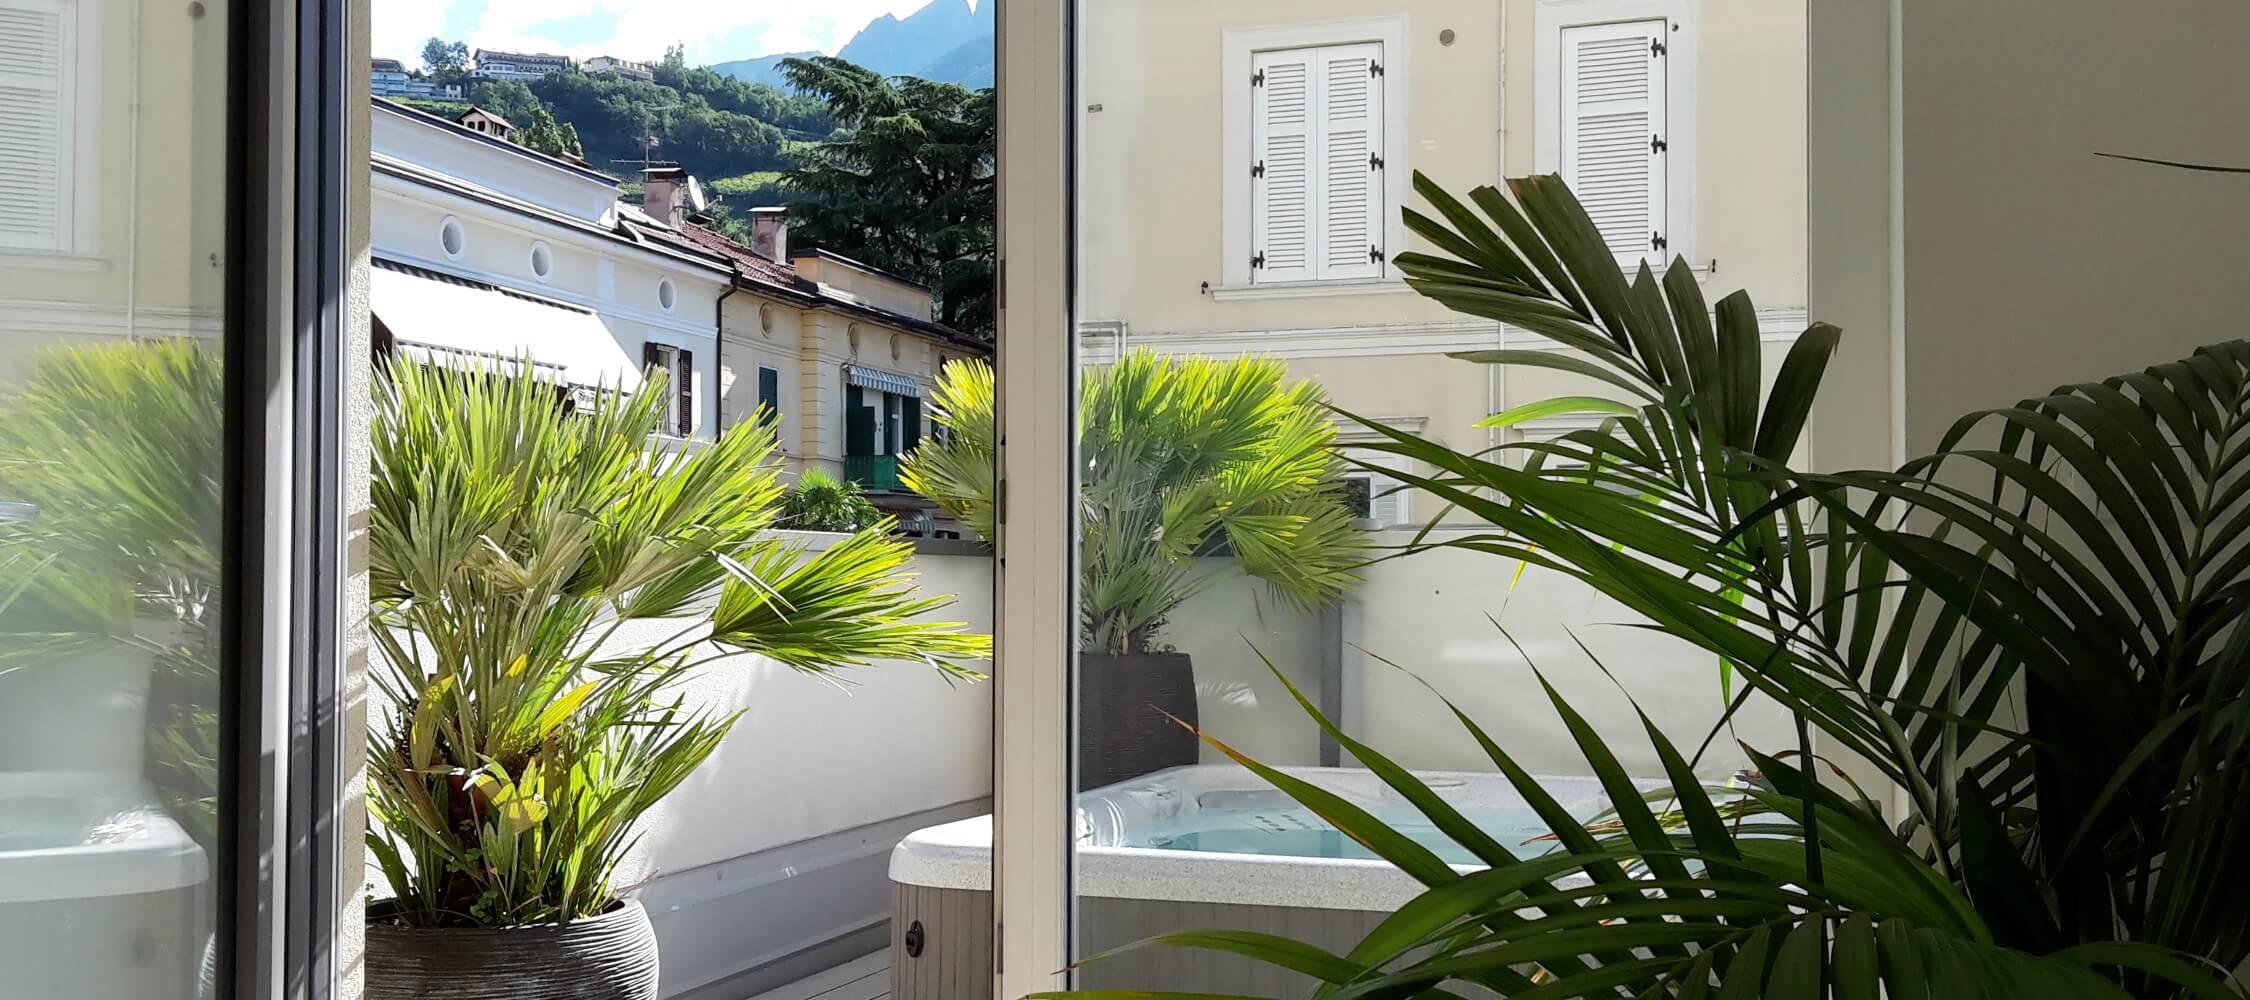 City_Hotel_Merano_Spa_Terrasse_Jacuzzi_Whirlpool_Anguane_20160806_094213_2250x1000